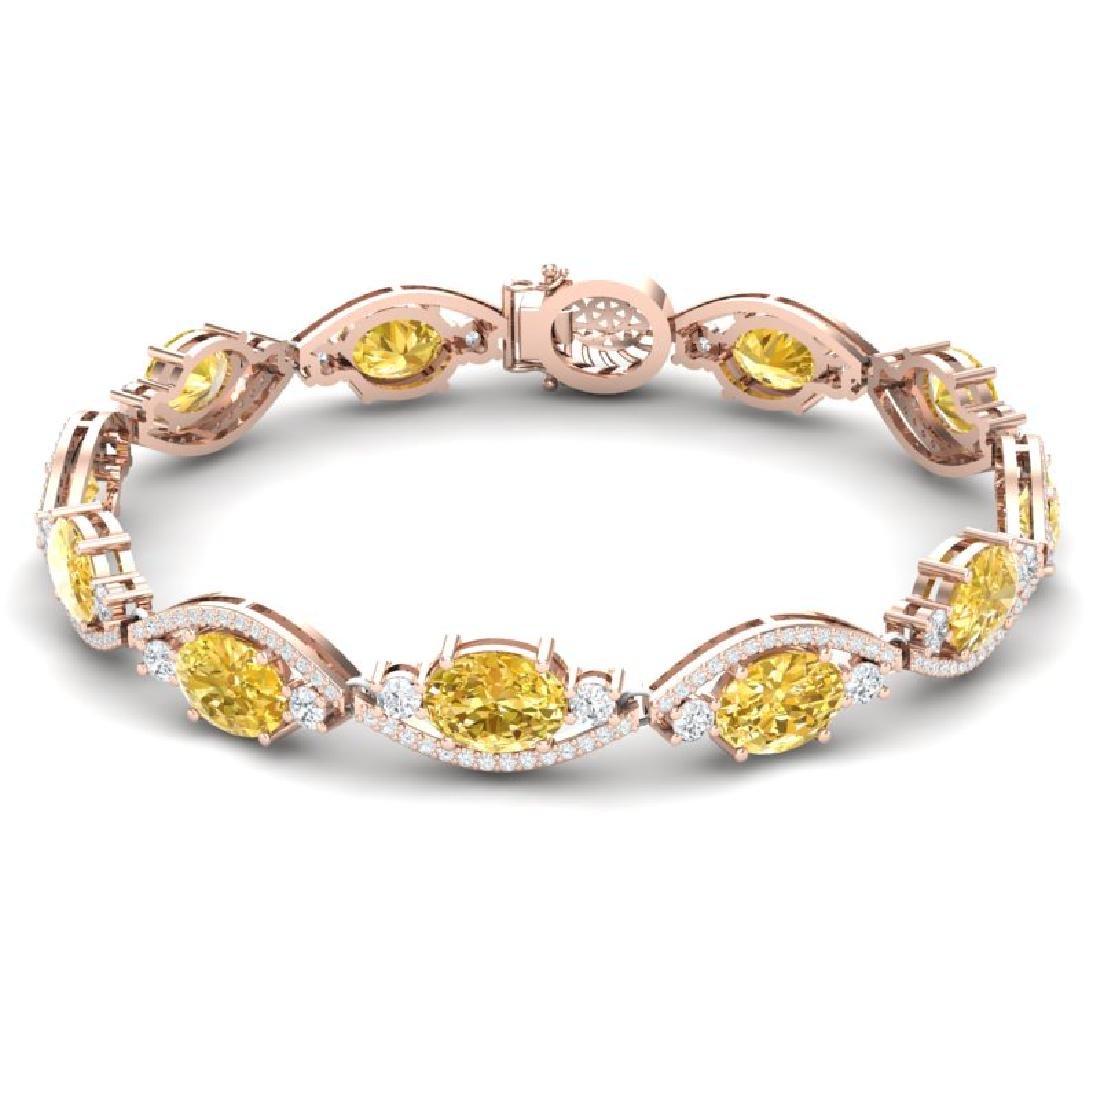 18.3 CTW Royalty Canary Citrine & VS Diamond Bracelet - 3